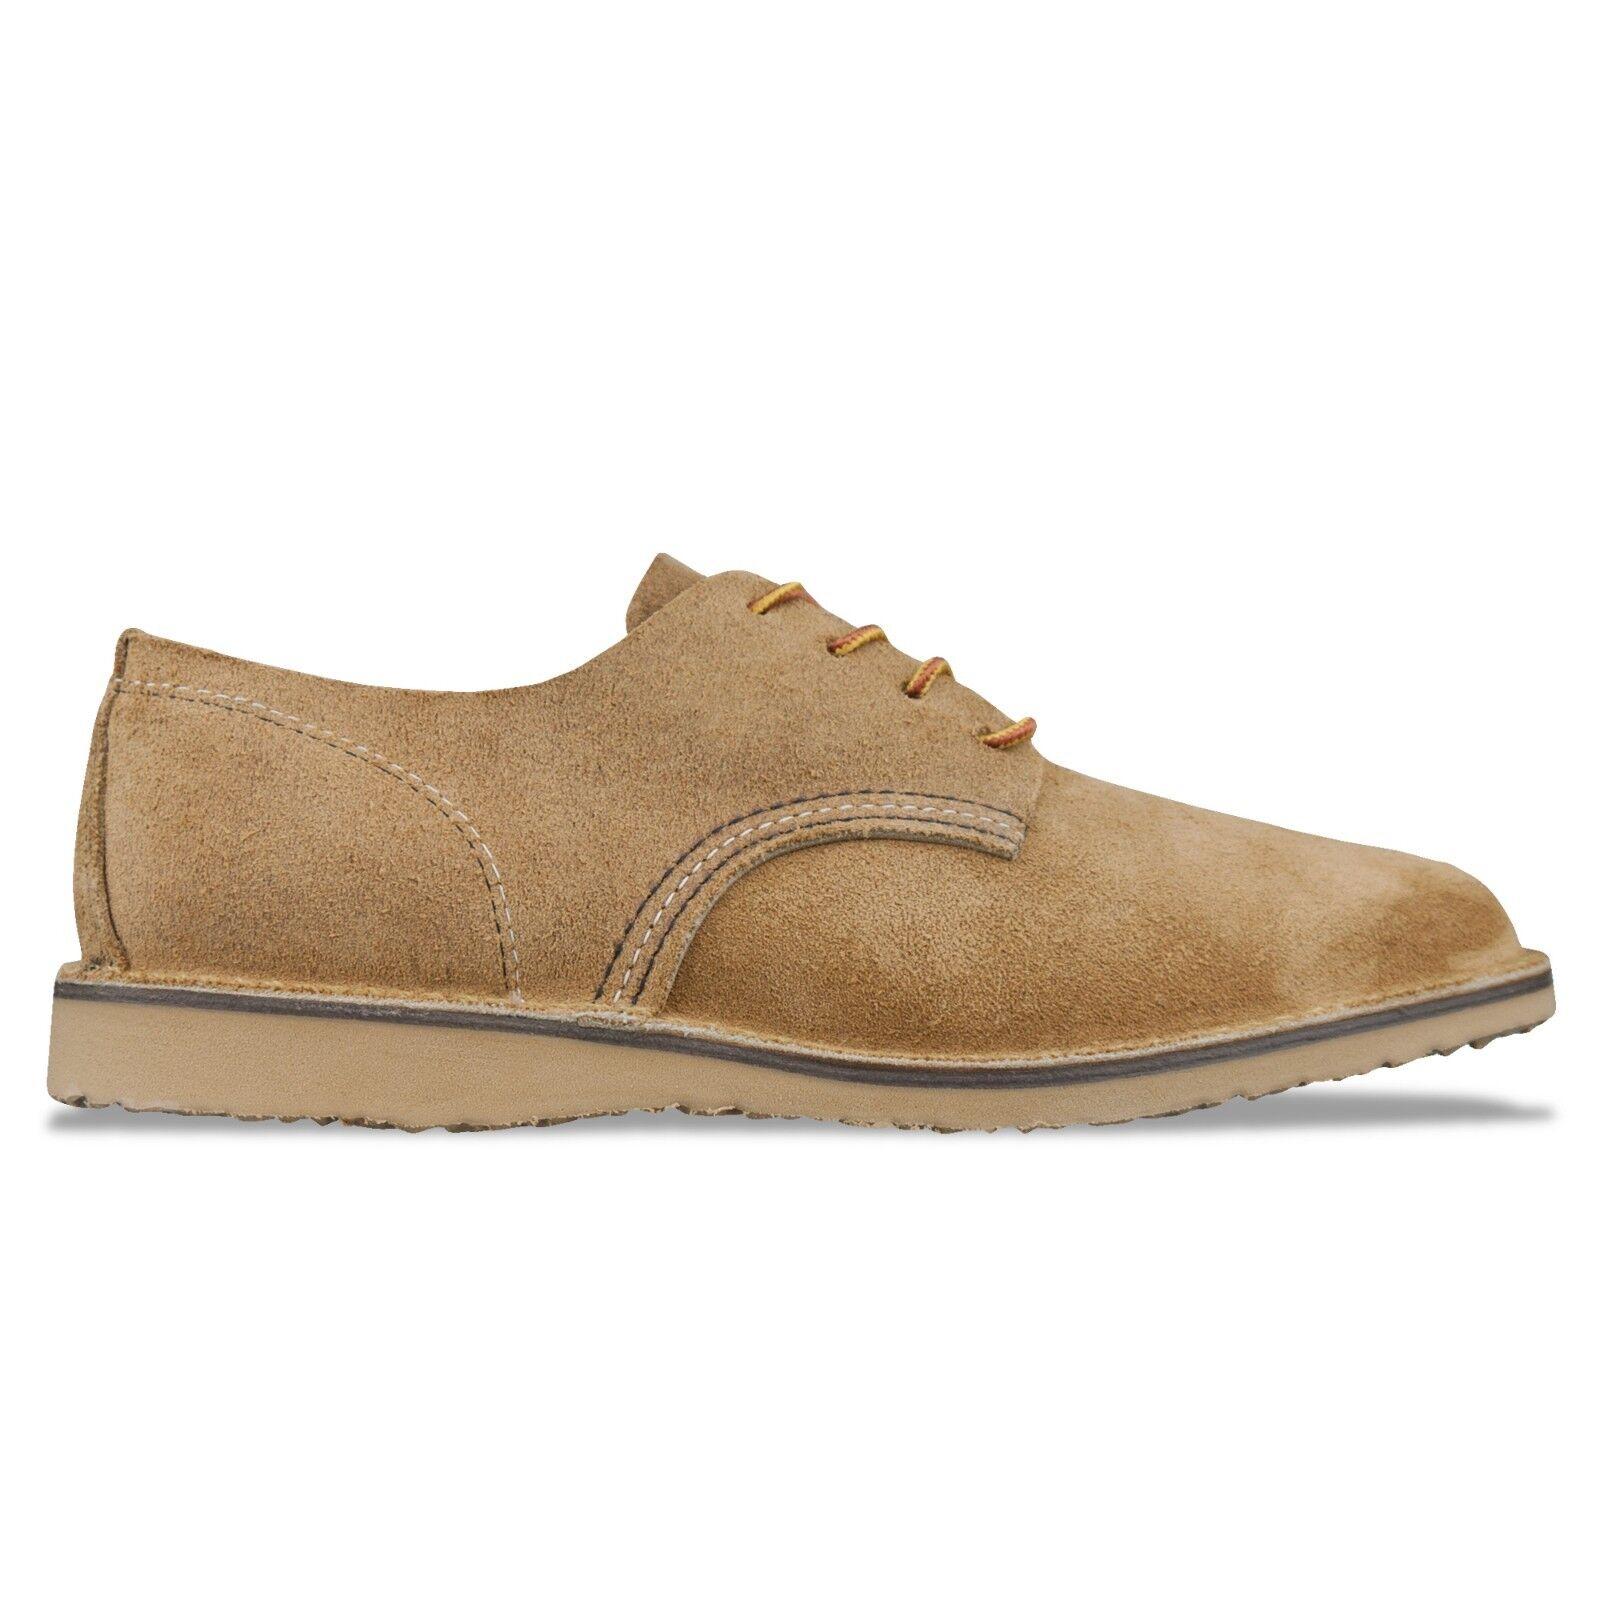 RED WING Chaussures - 3302 Weekender Oxford - Hawthorne Hawthorne Hawthorne muleskin - Neuf en bo?te ba32da